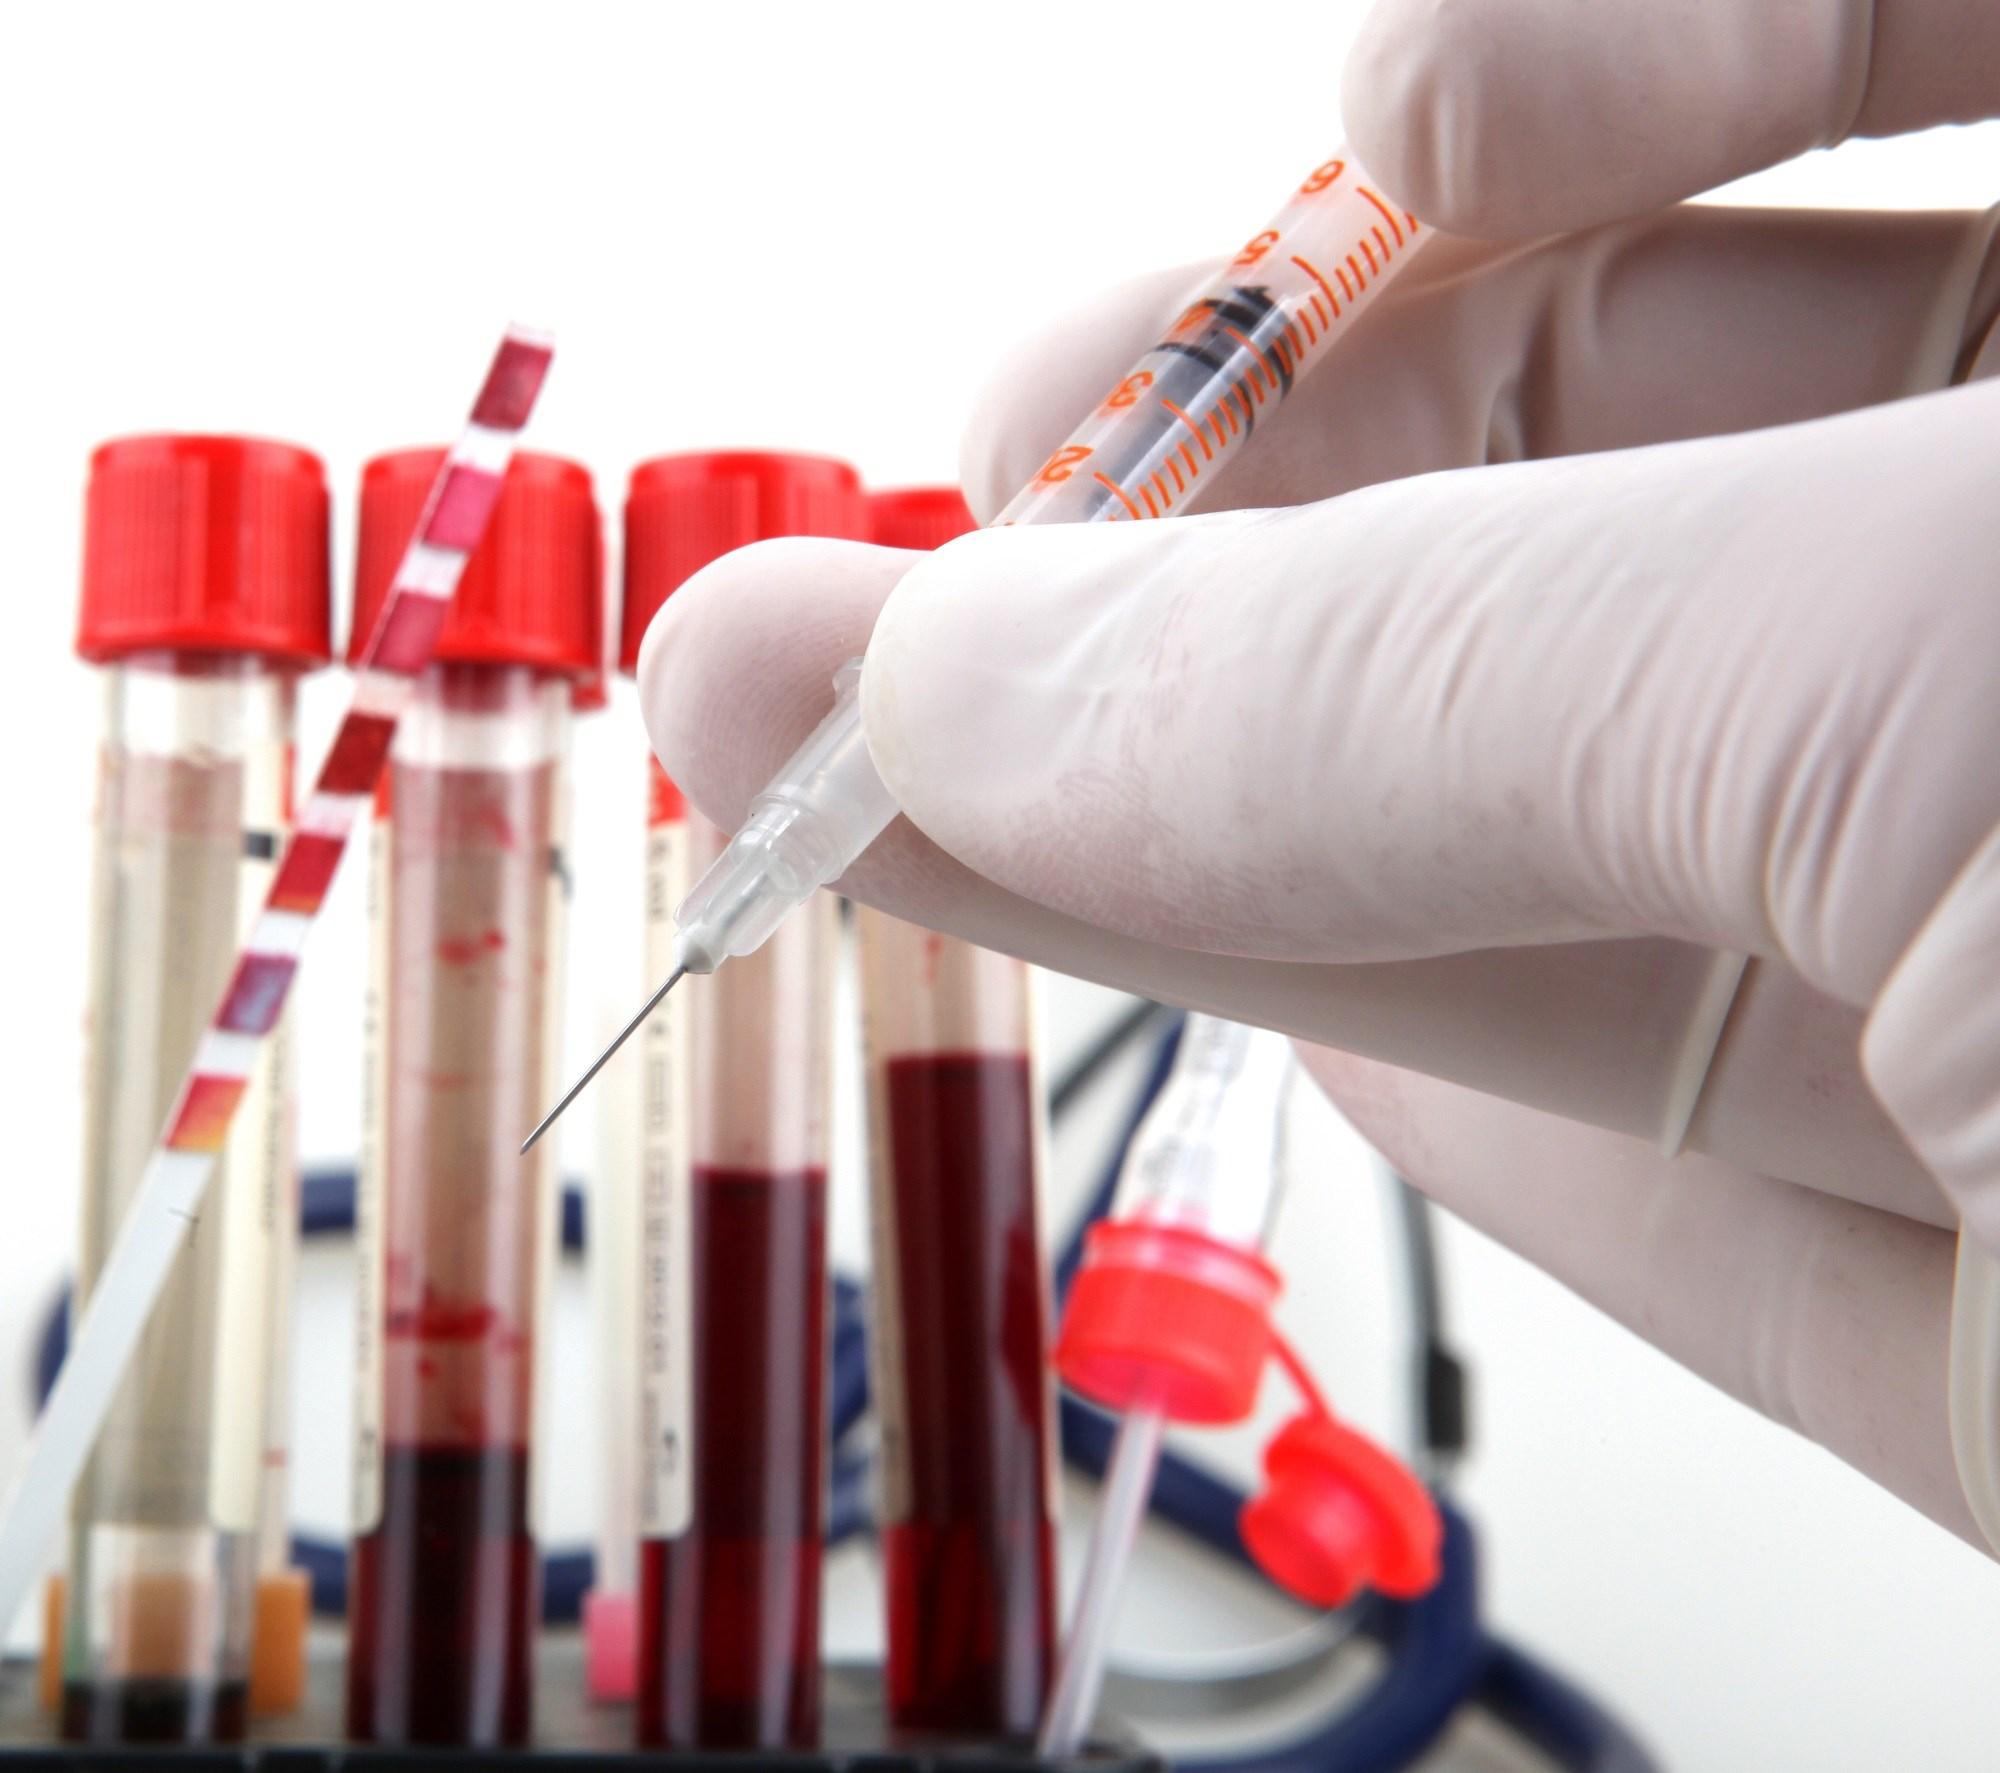 Effect of Dengue Serostatus on Dengue Vaccine Safety and Efficacy